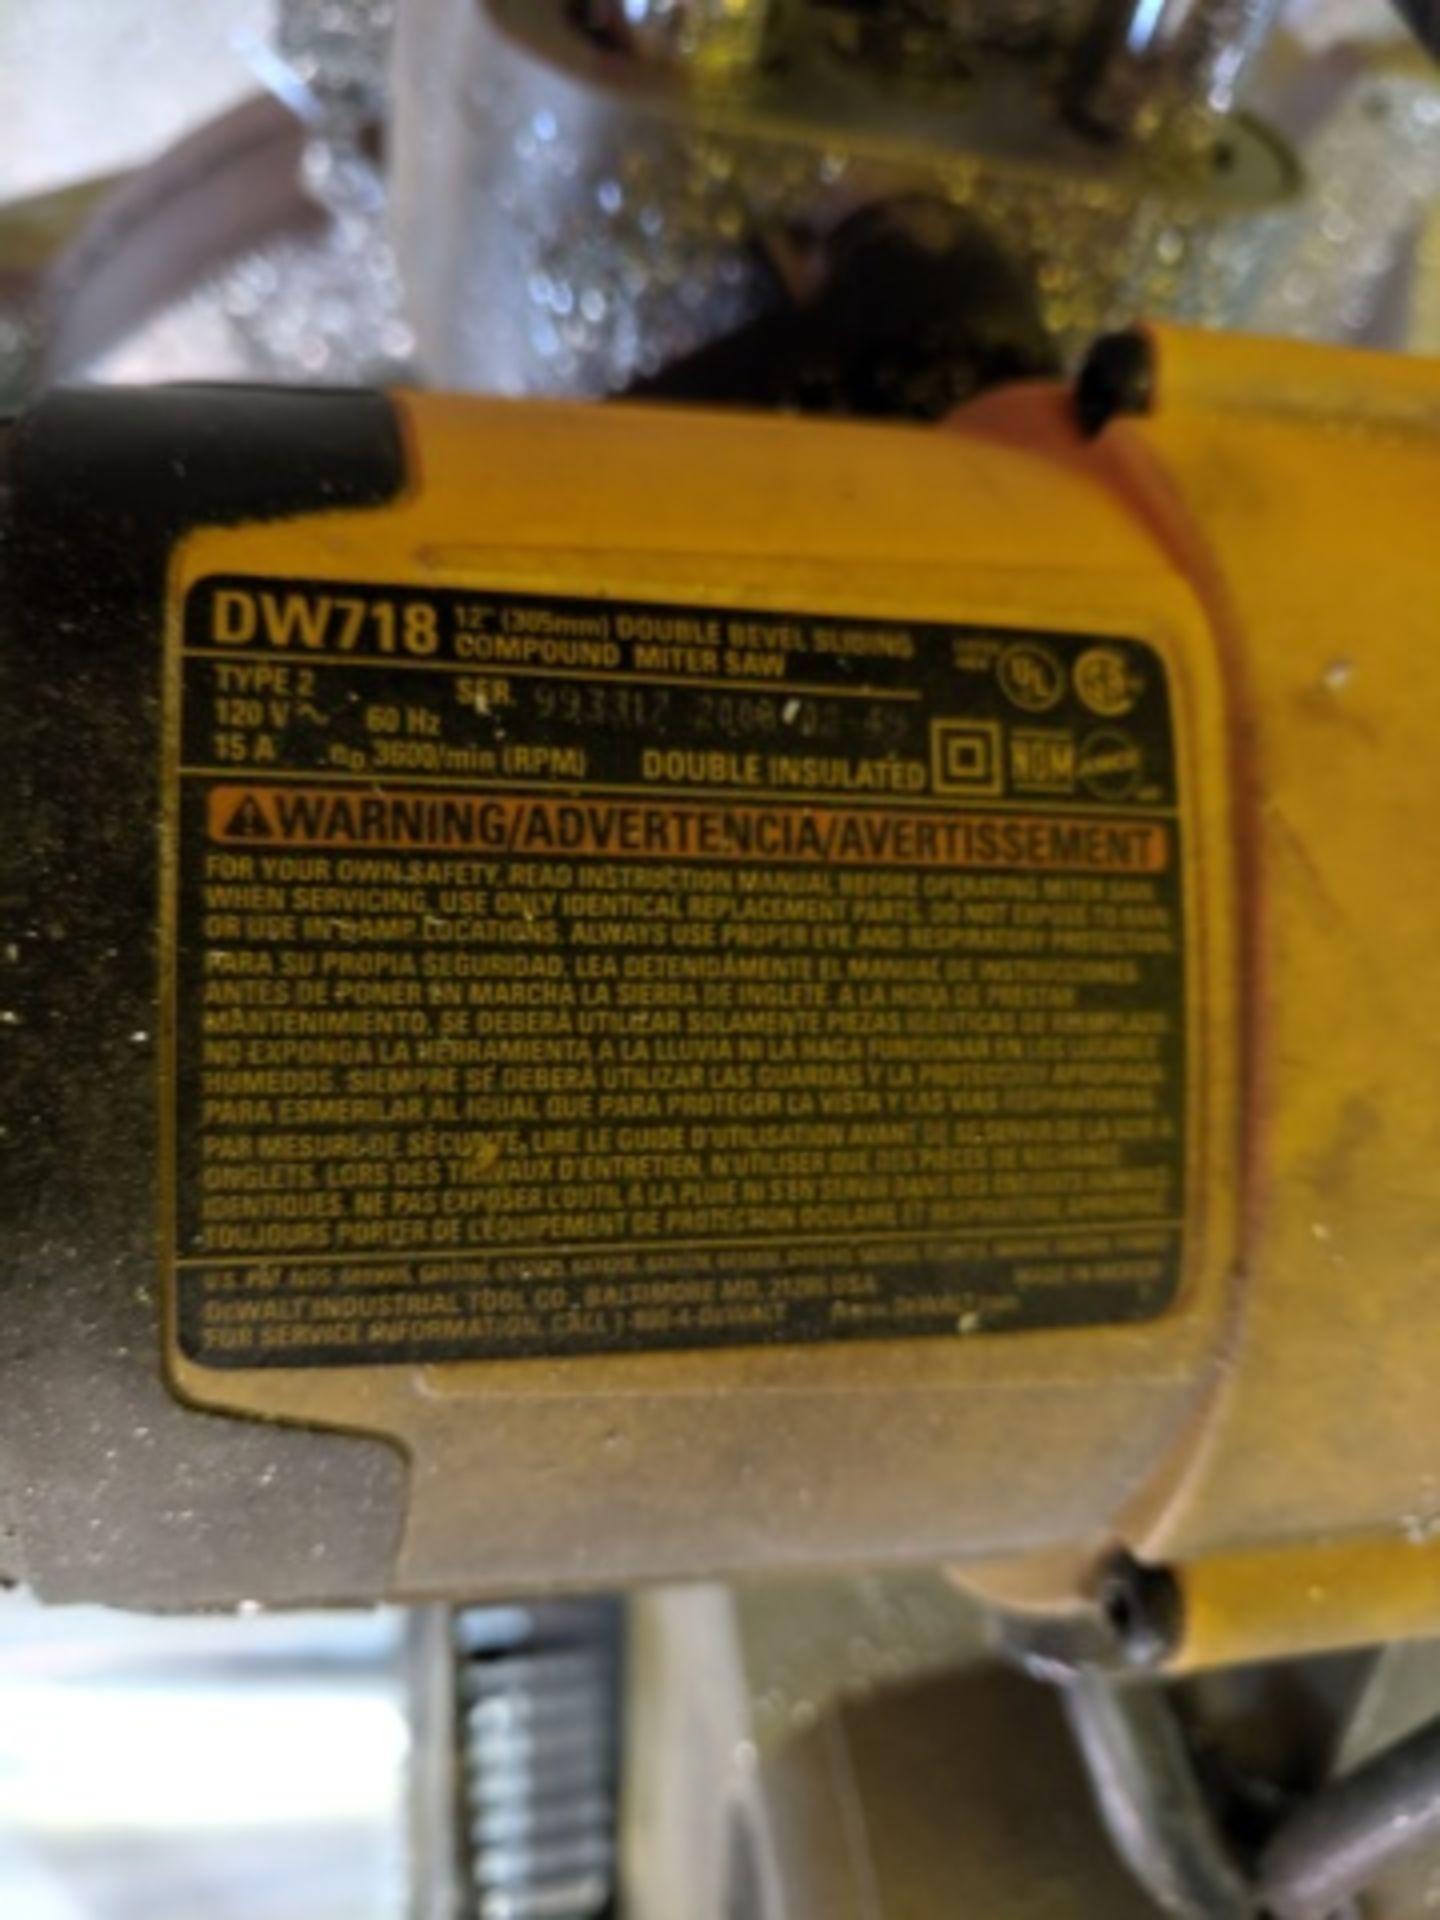 Dewalt DW718 Miter Saw - Image 3 of 3